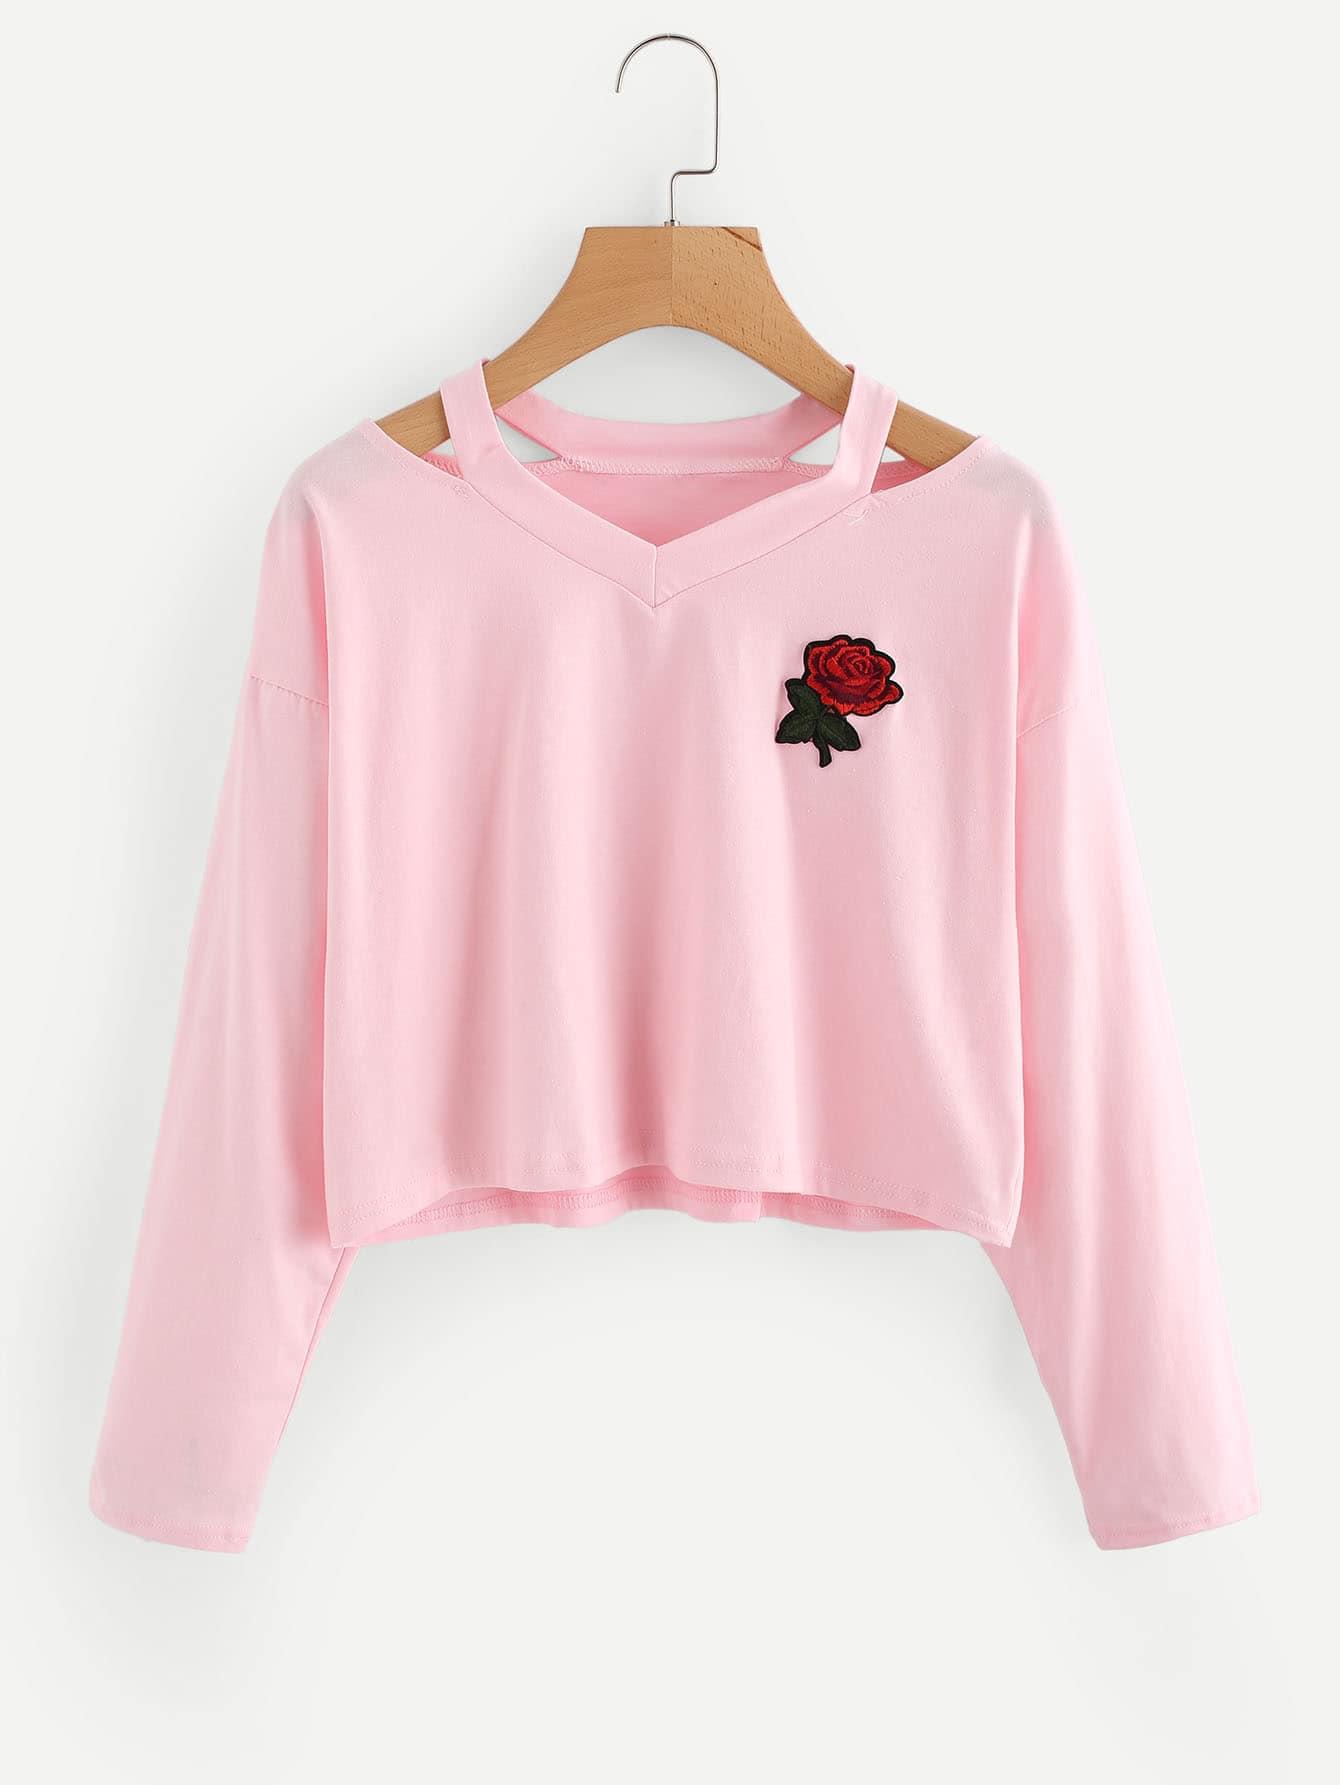 T-Shirt mit Cut Out auf dem Ausschnitt und Rosefleck